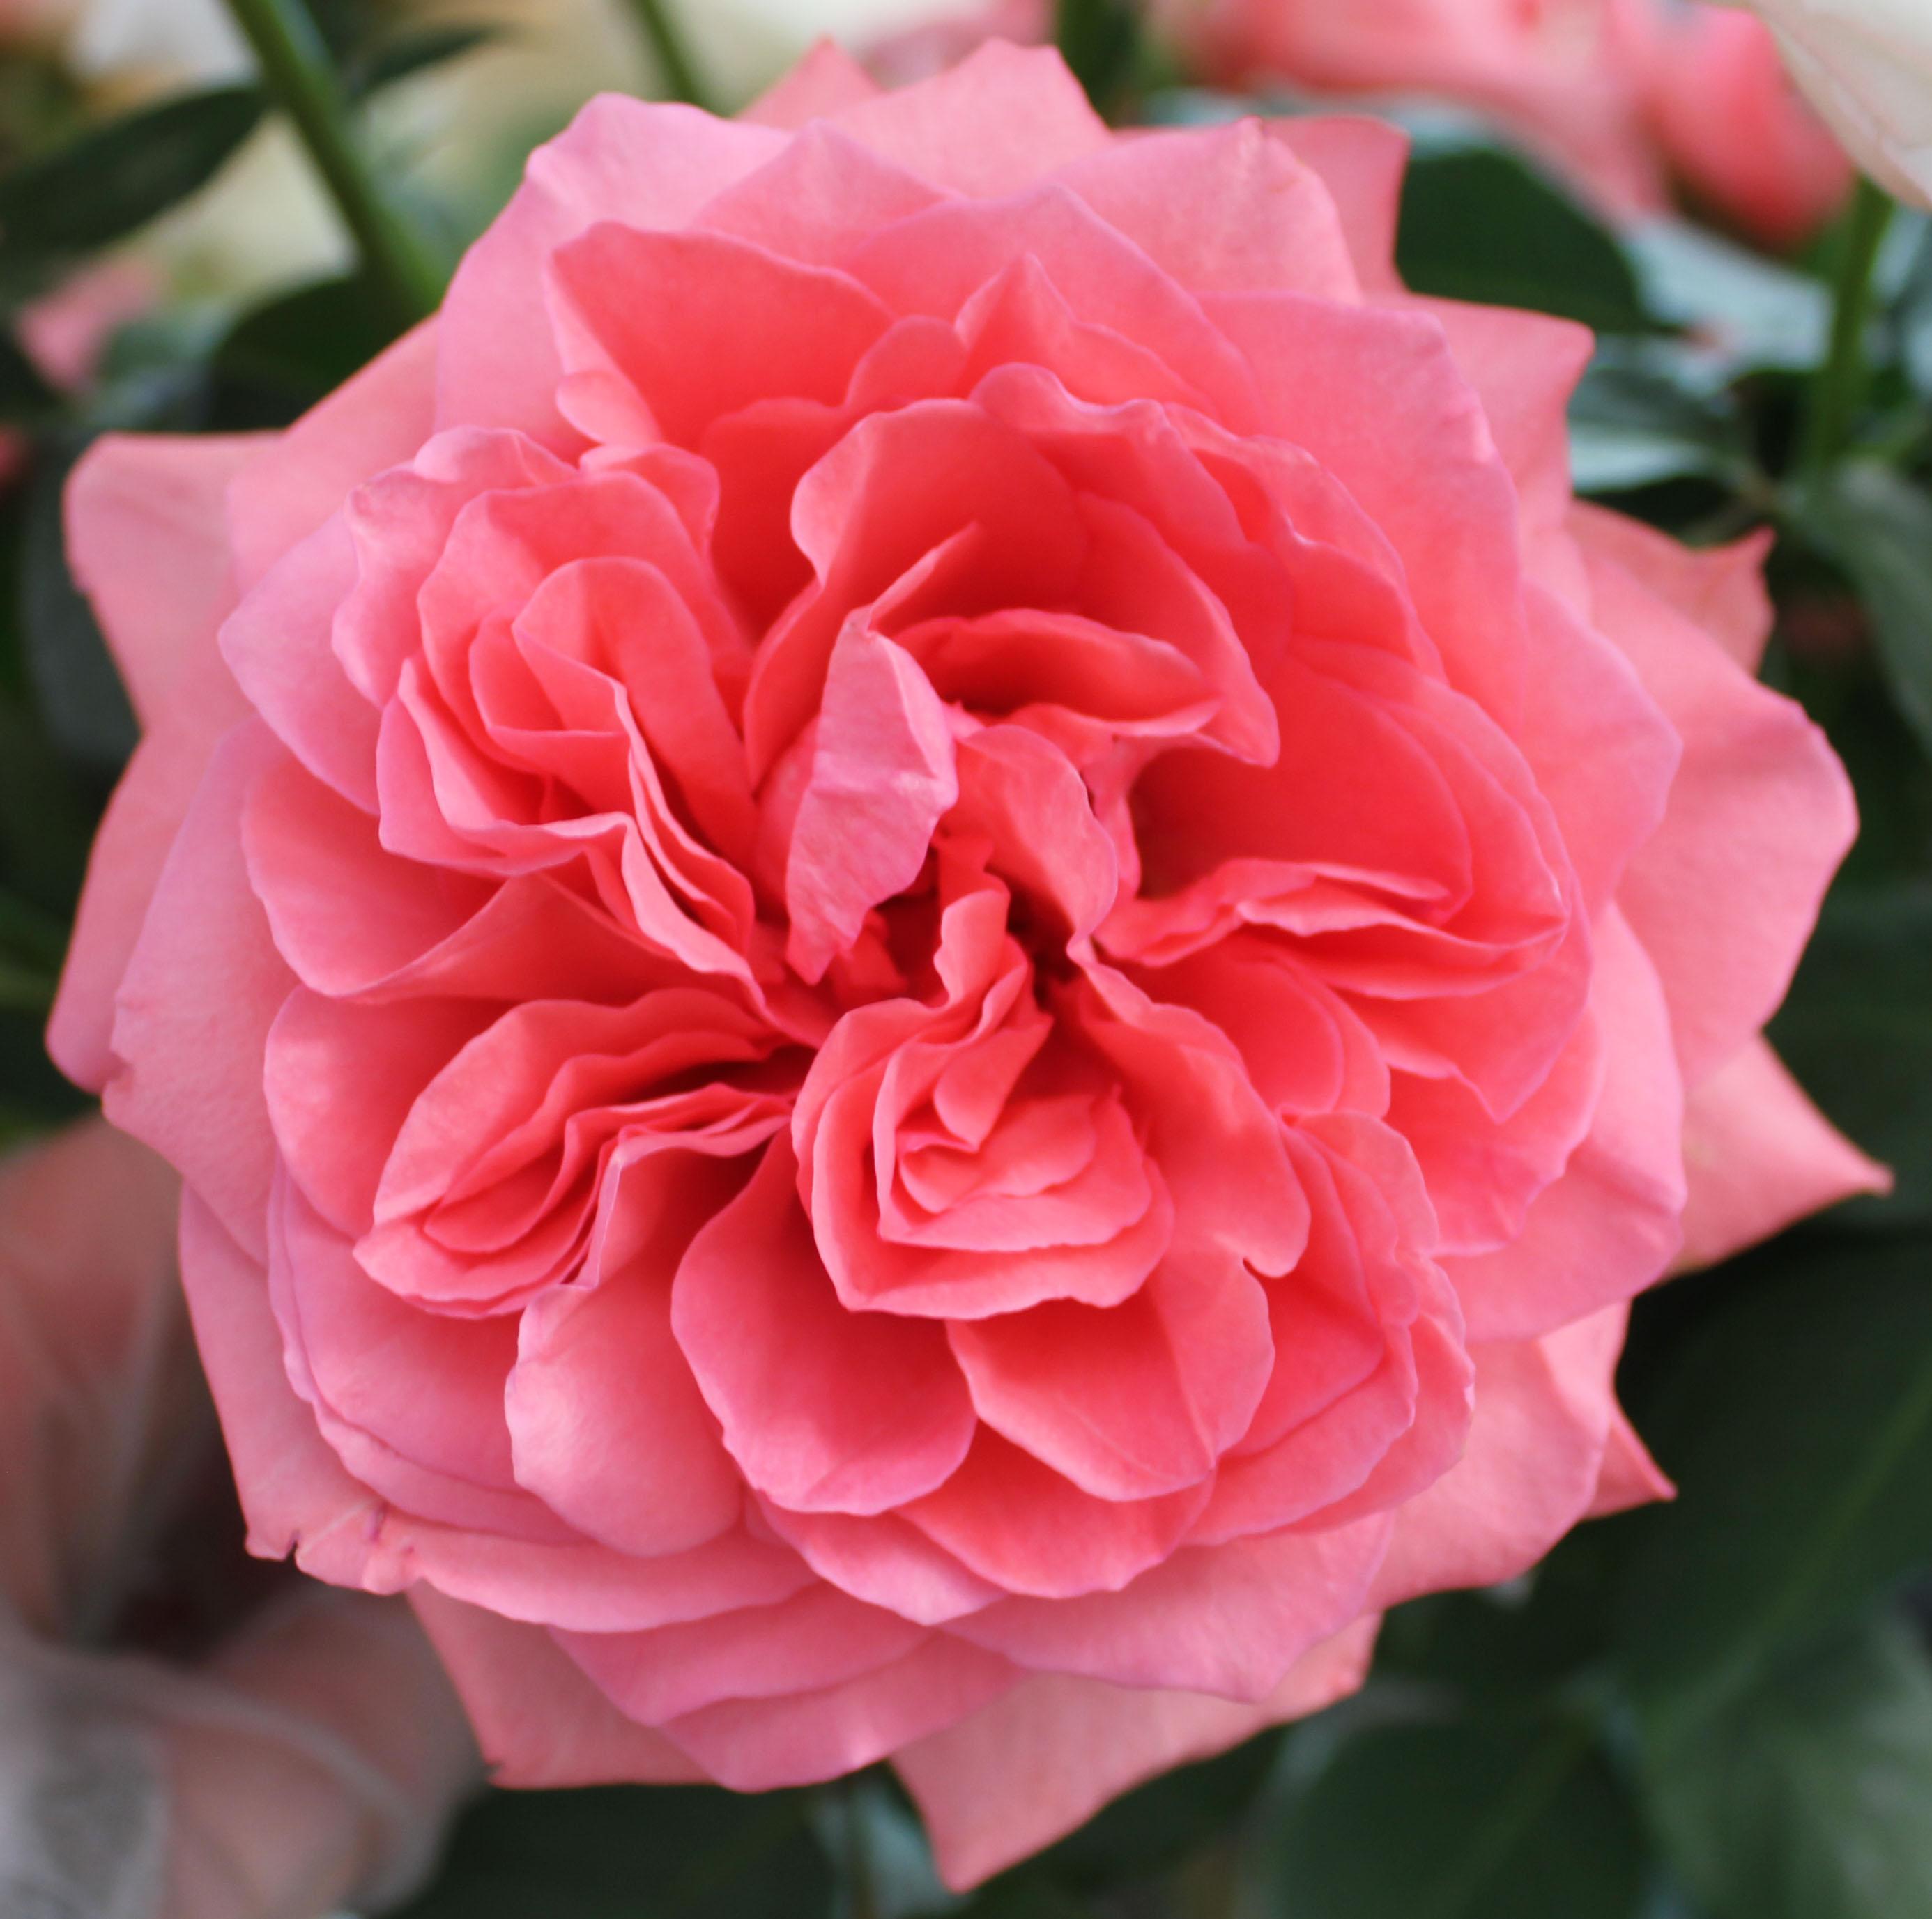 garden roses arthur rimeaud - Garden Rose